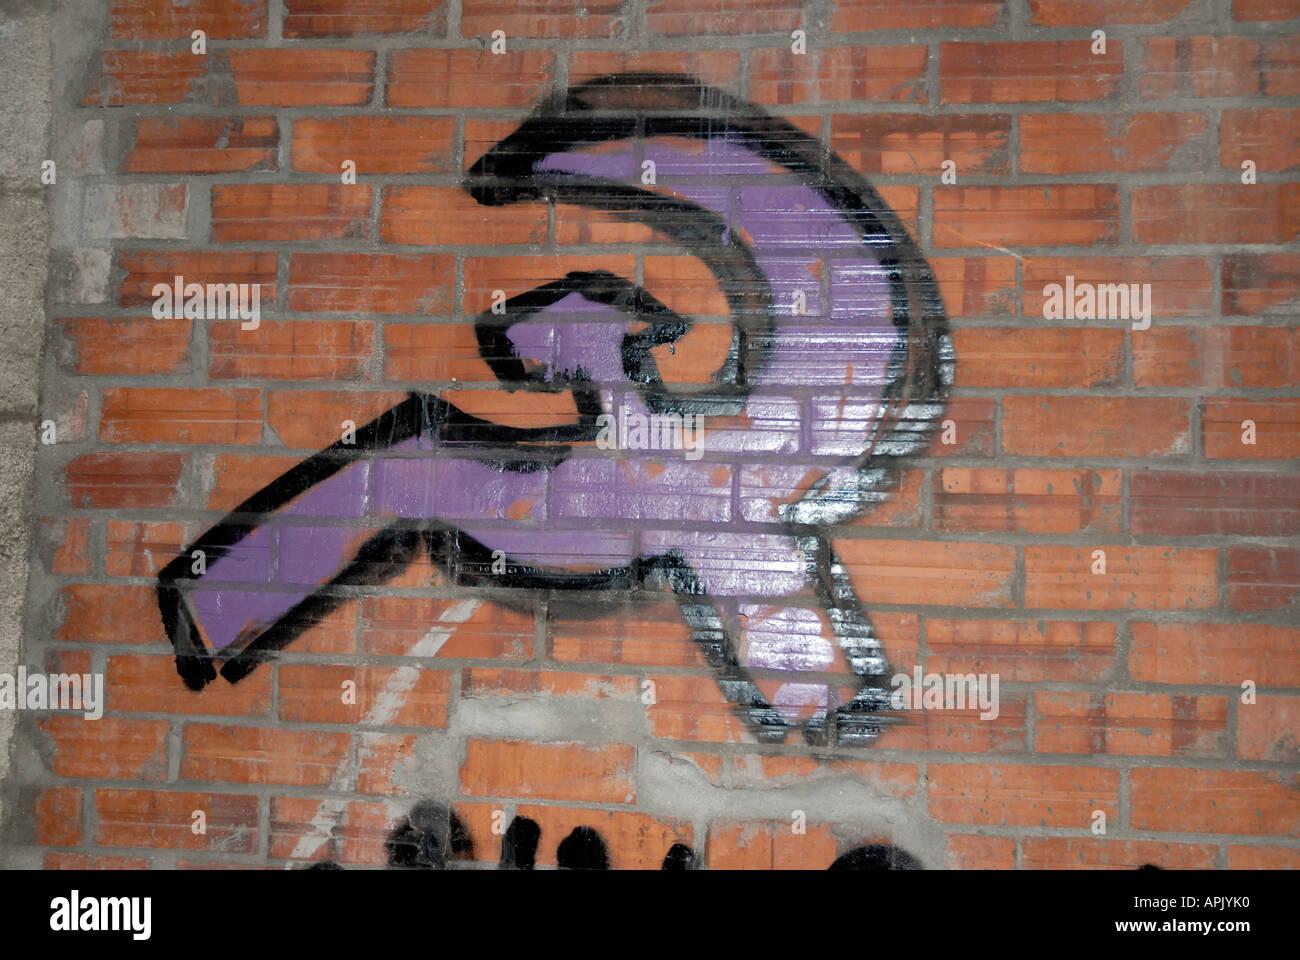 Hammer and sickle Graffitti Girona Catalonia Spain - Stock Image